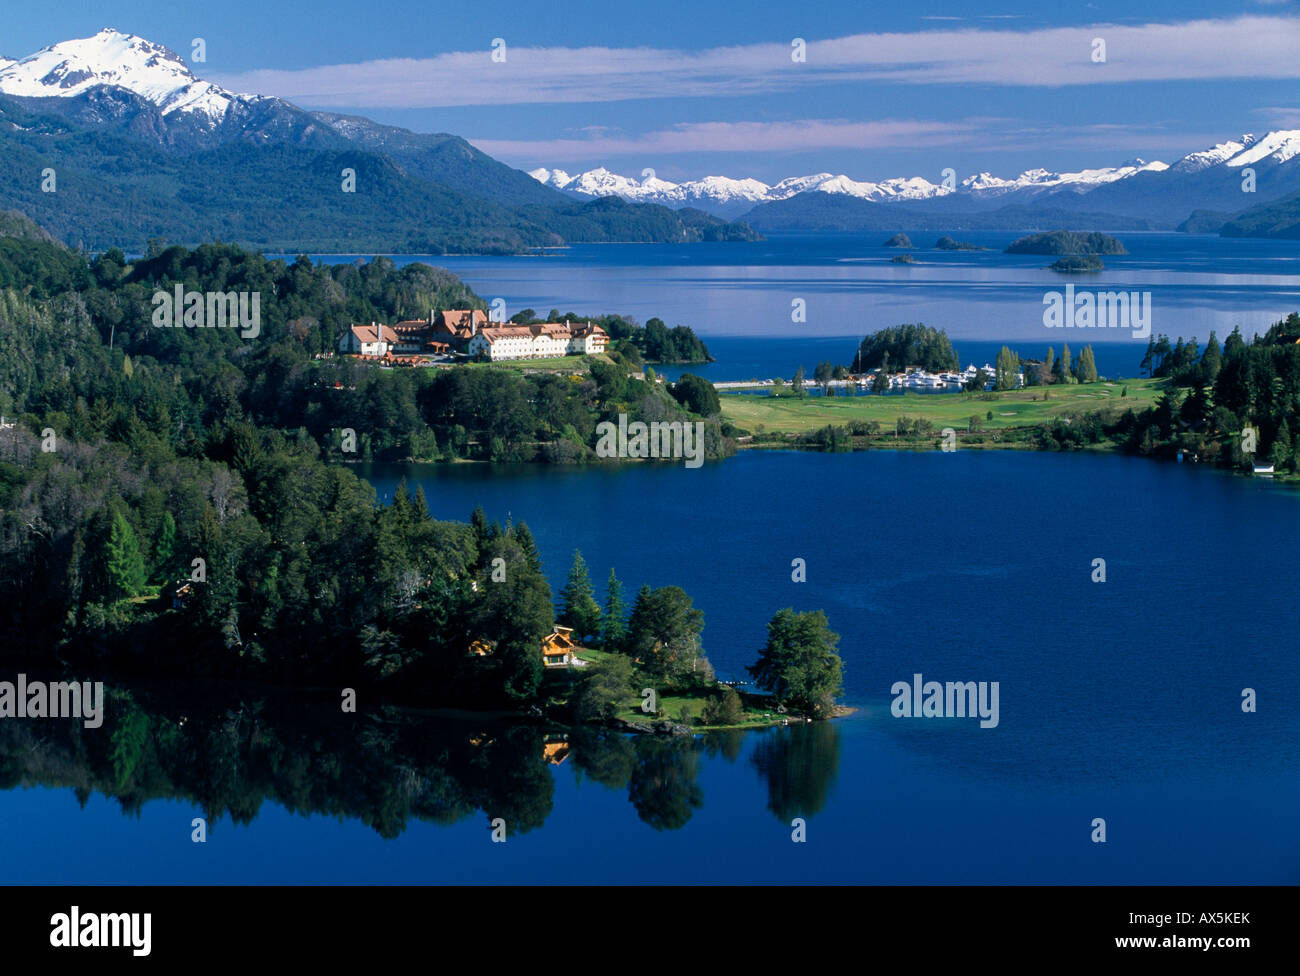 Lago Nahuel Huapi (Lake Nahuel Huapi) and the Llao-Llao Hotel, Lake District, Patagonia, Rio Negro Province, Argentina, - Stock Image